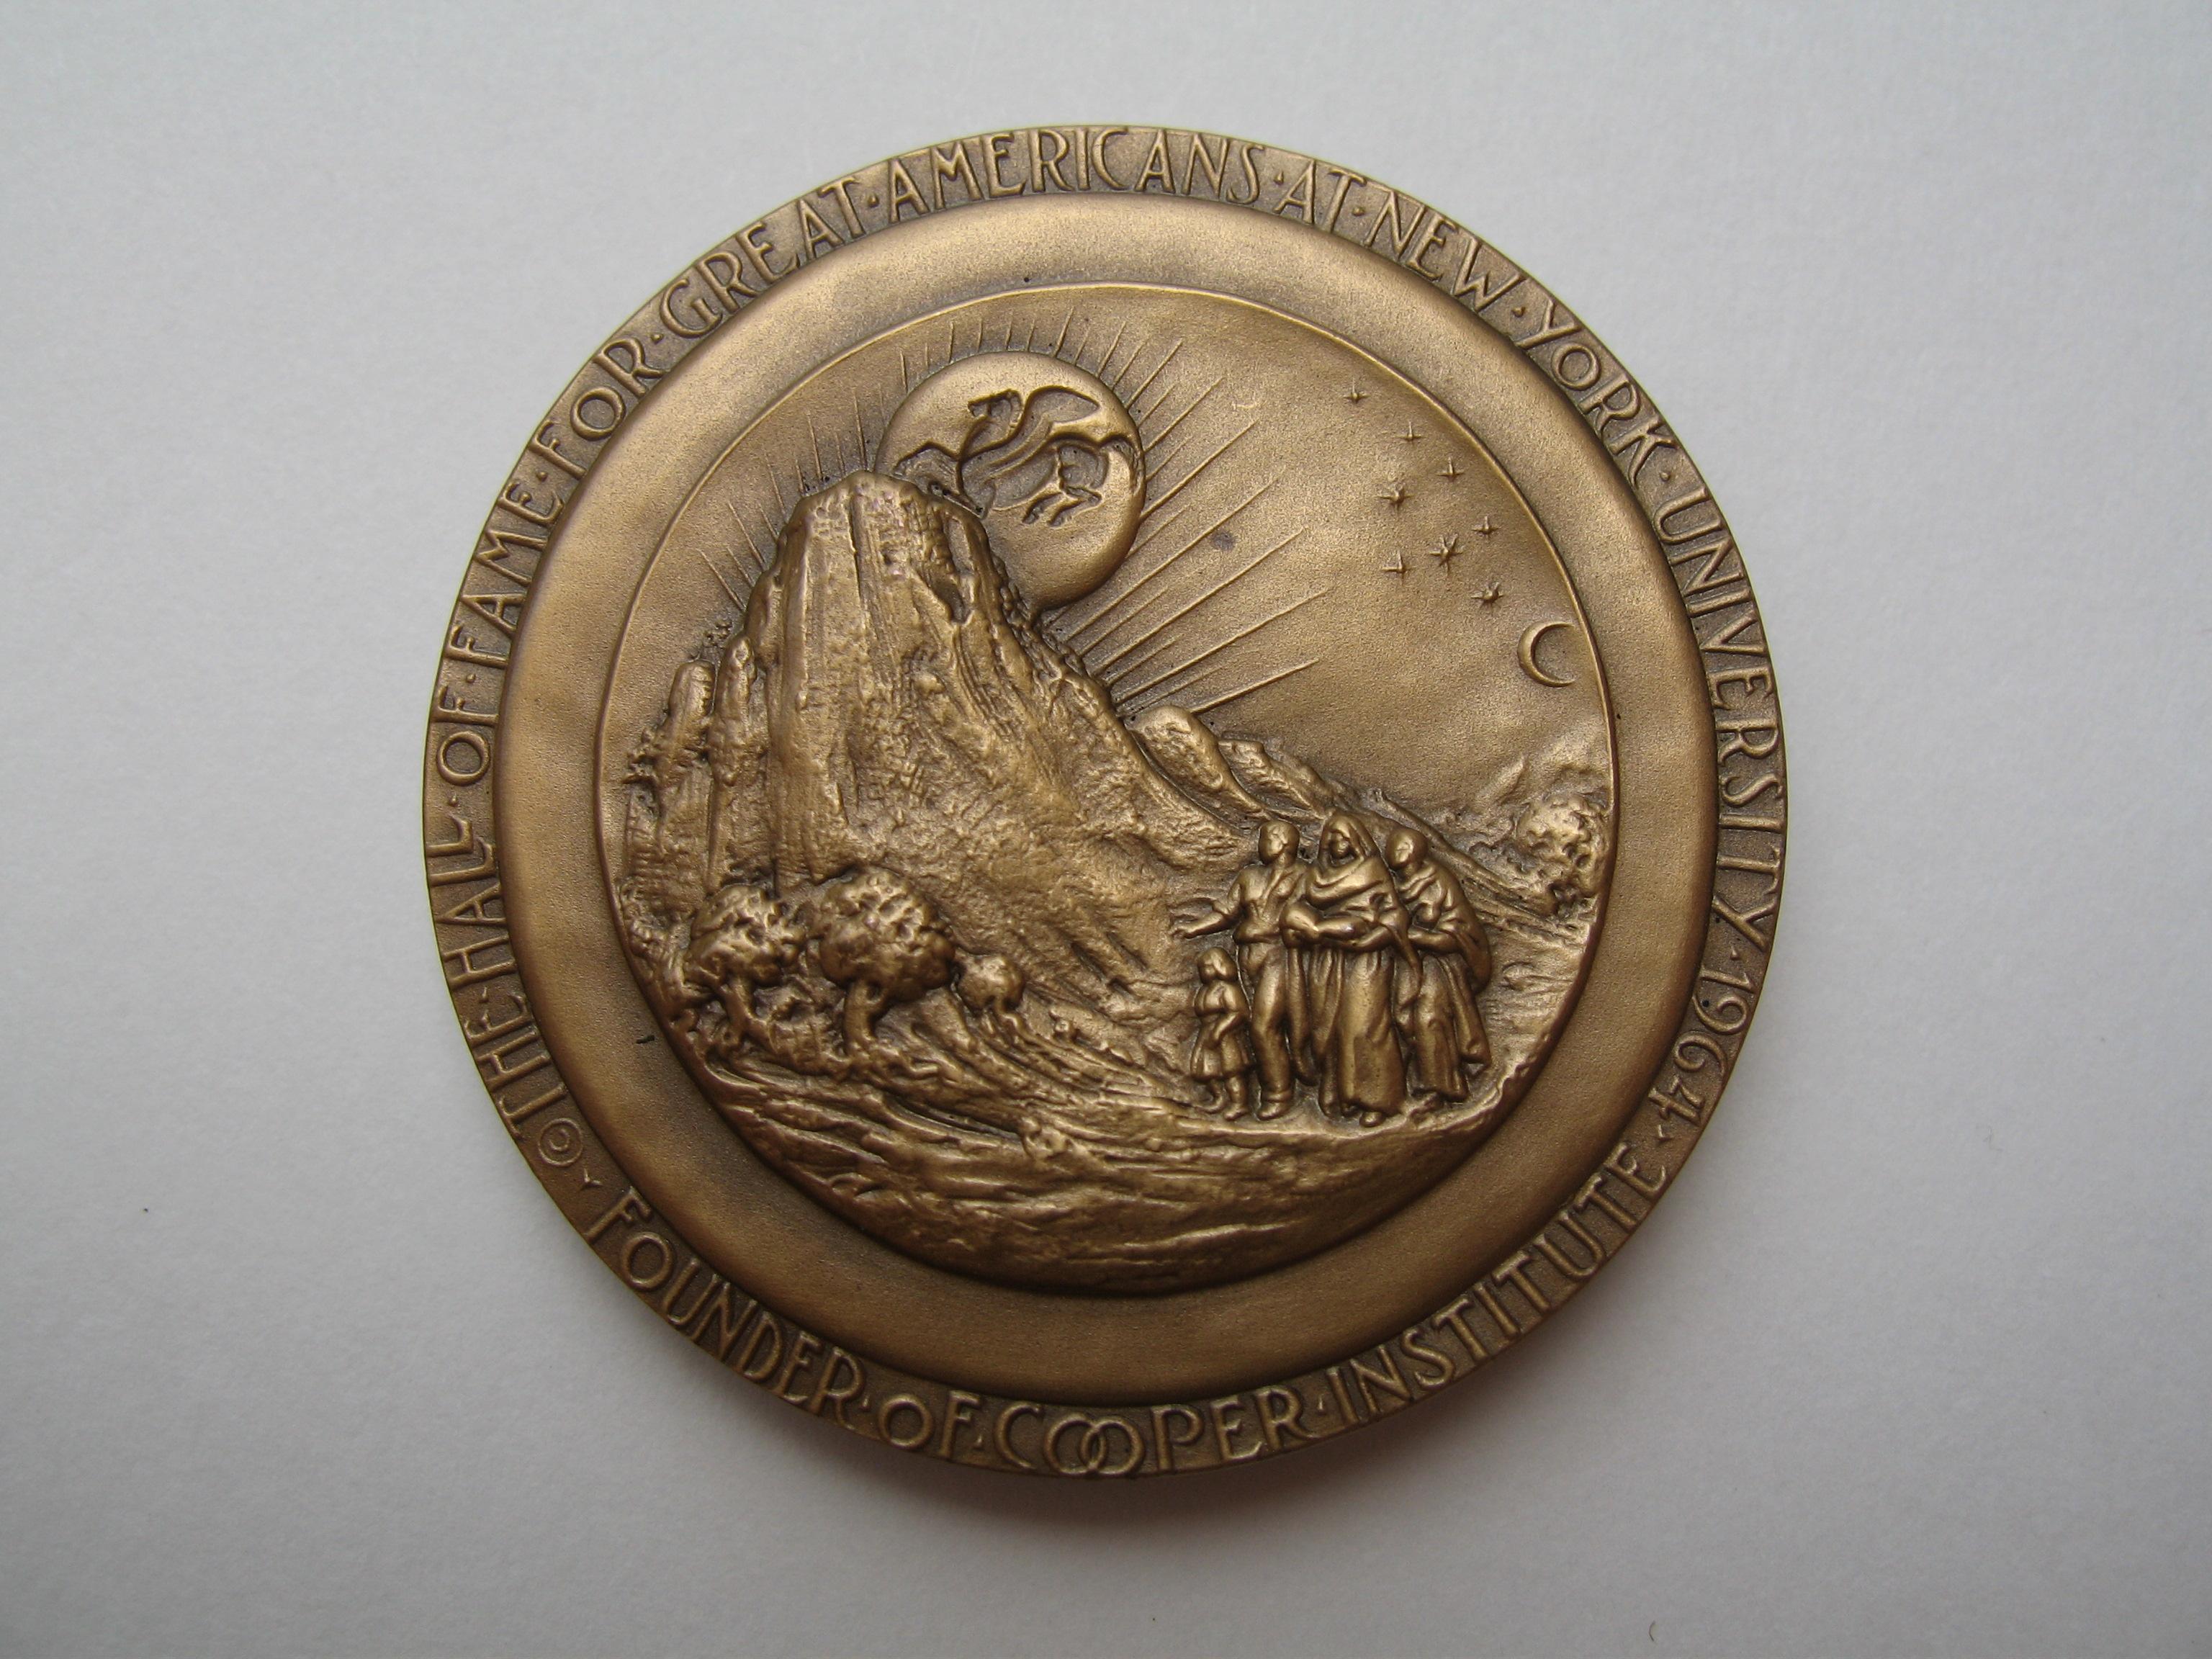 Medallic Art Company - Wikipedia